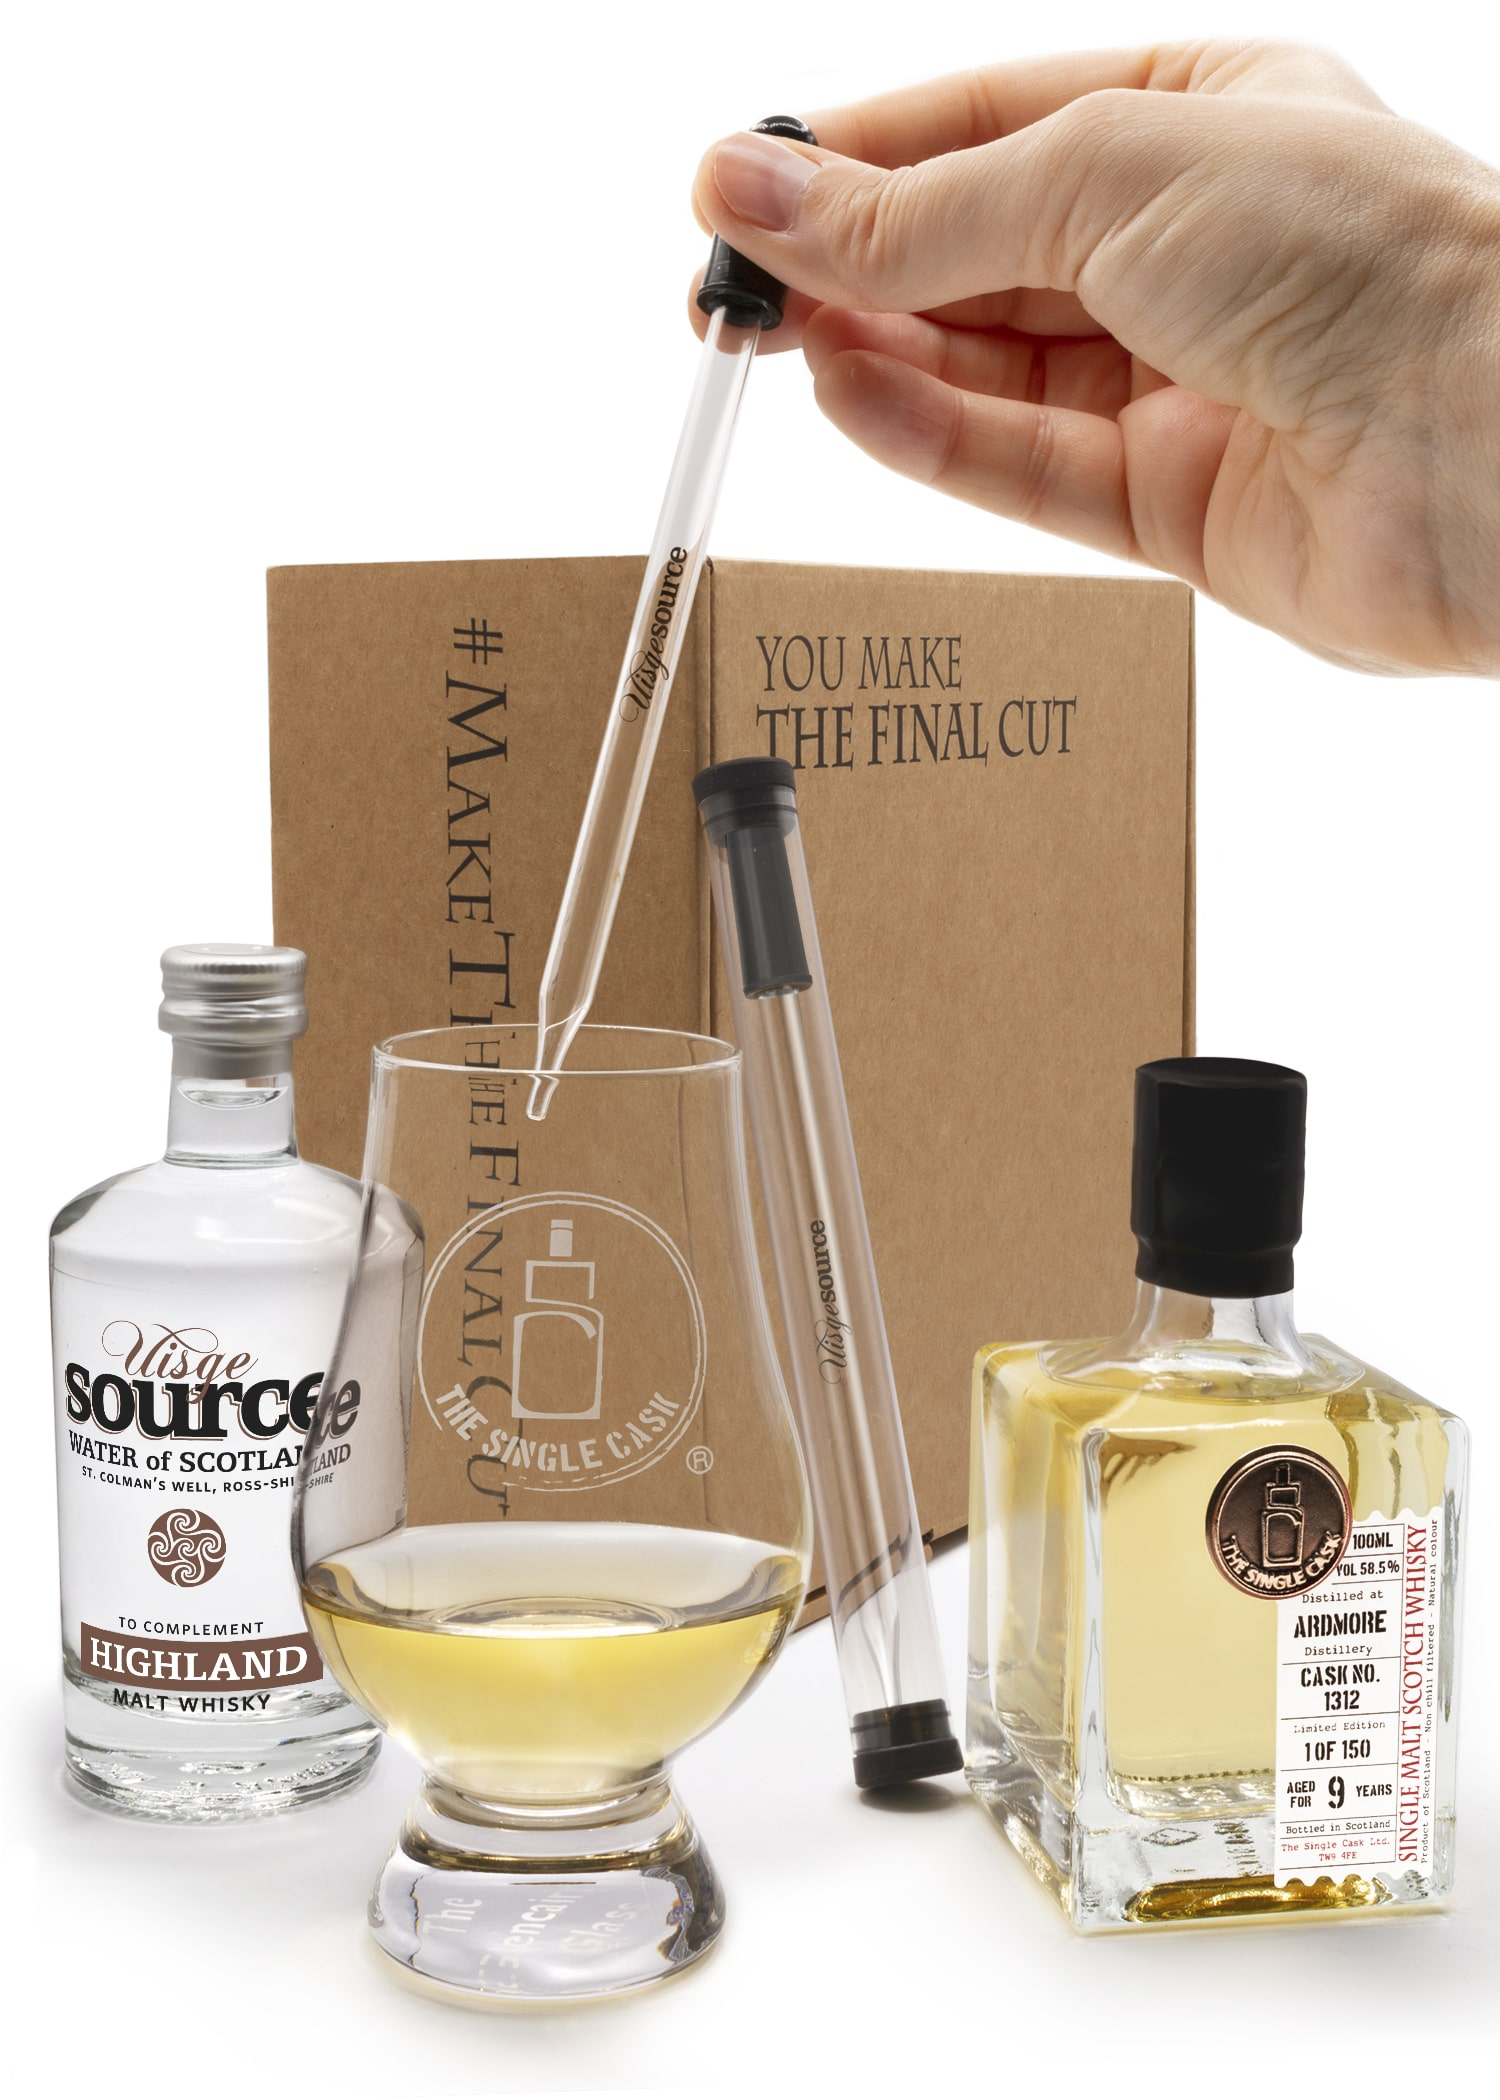 The Single Cask, Finest Single Malt Whiskey